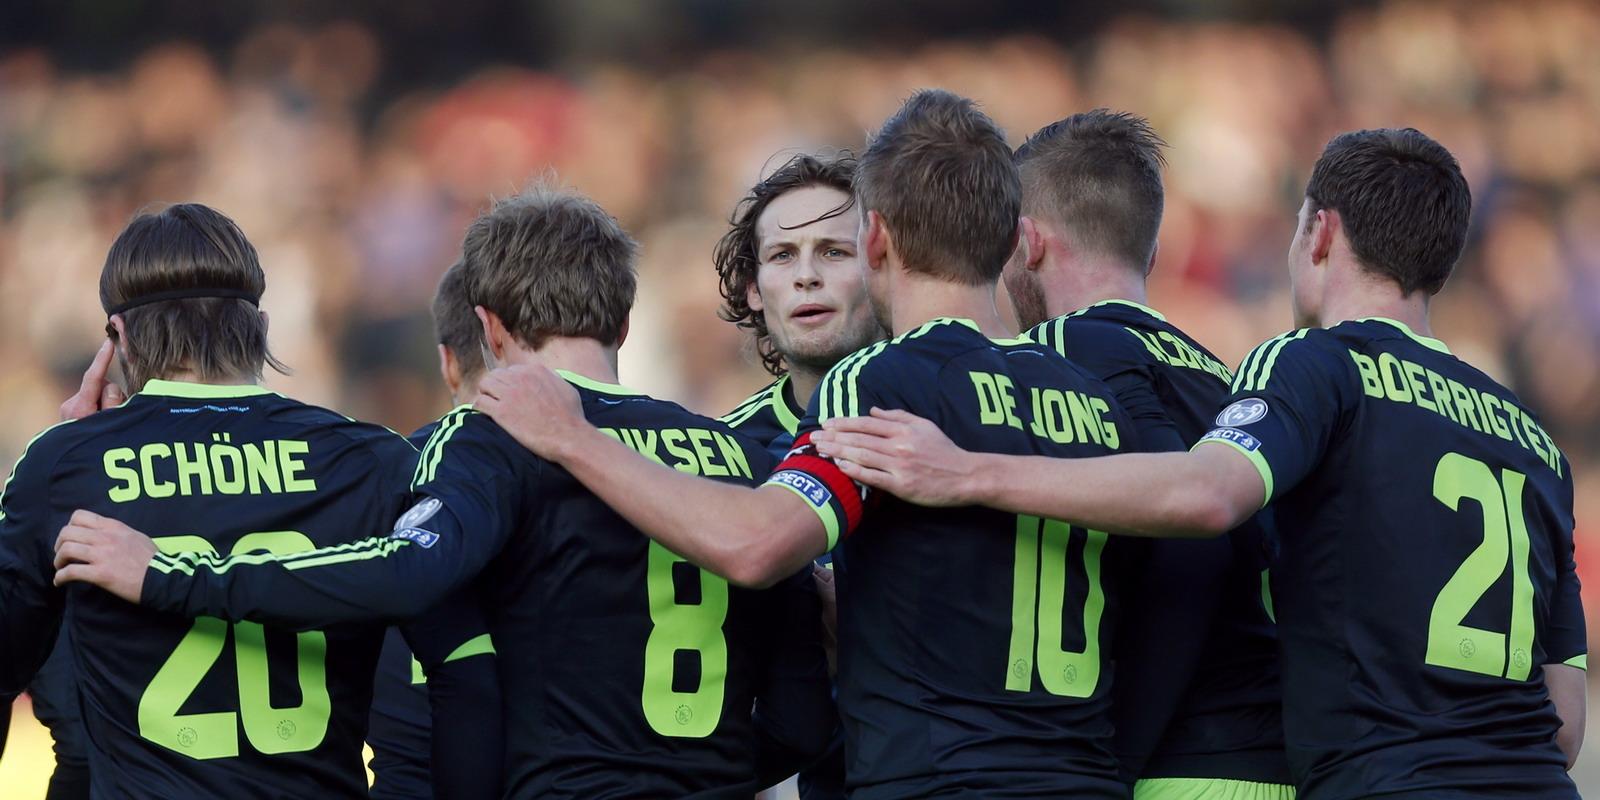 Ajax op één dag tegen RKC en De Graafschap